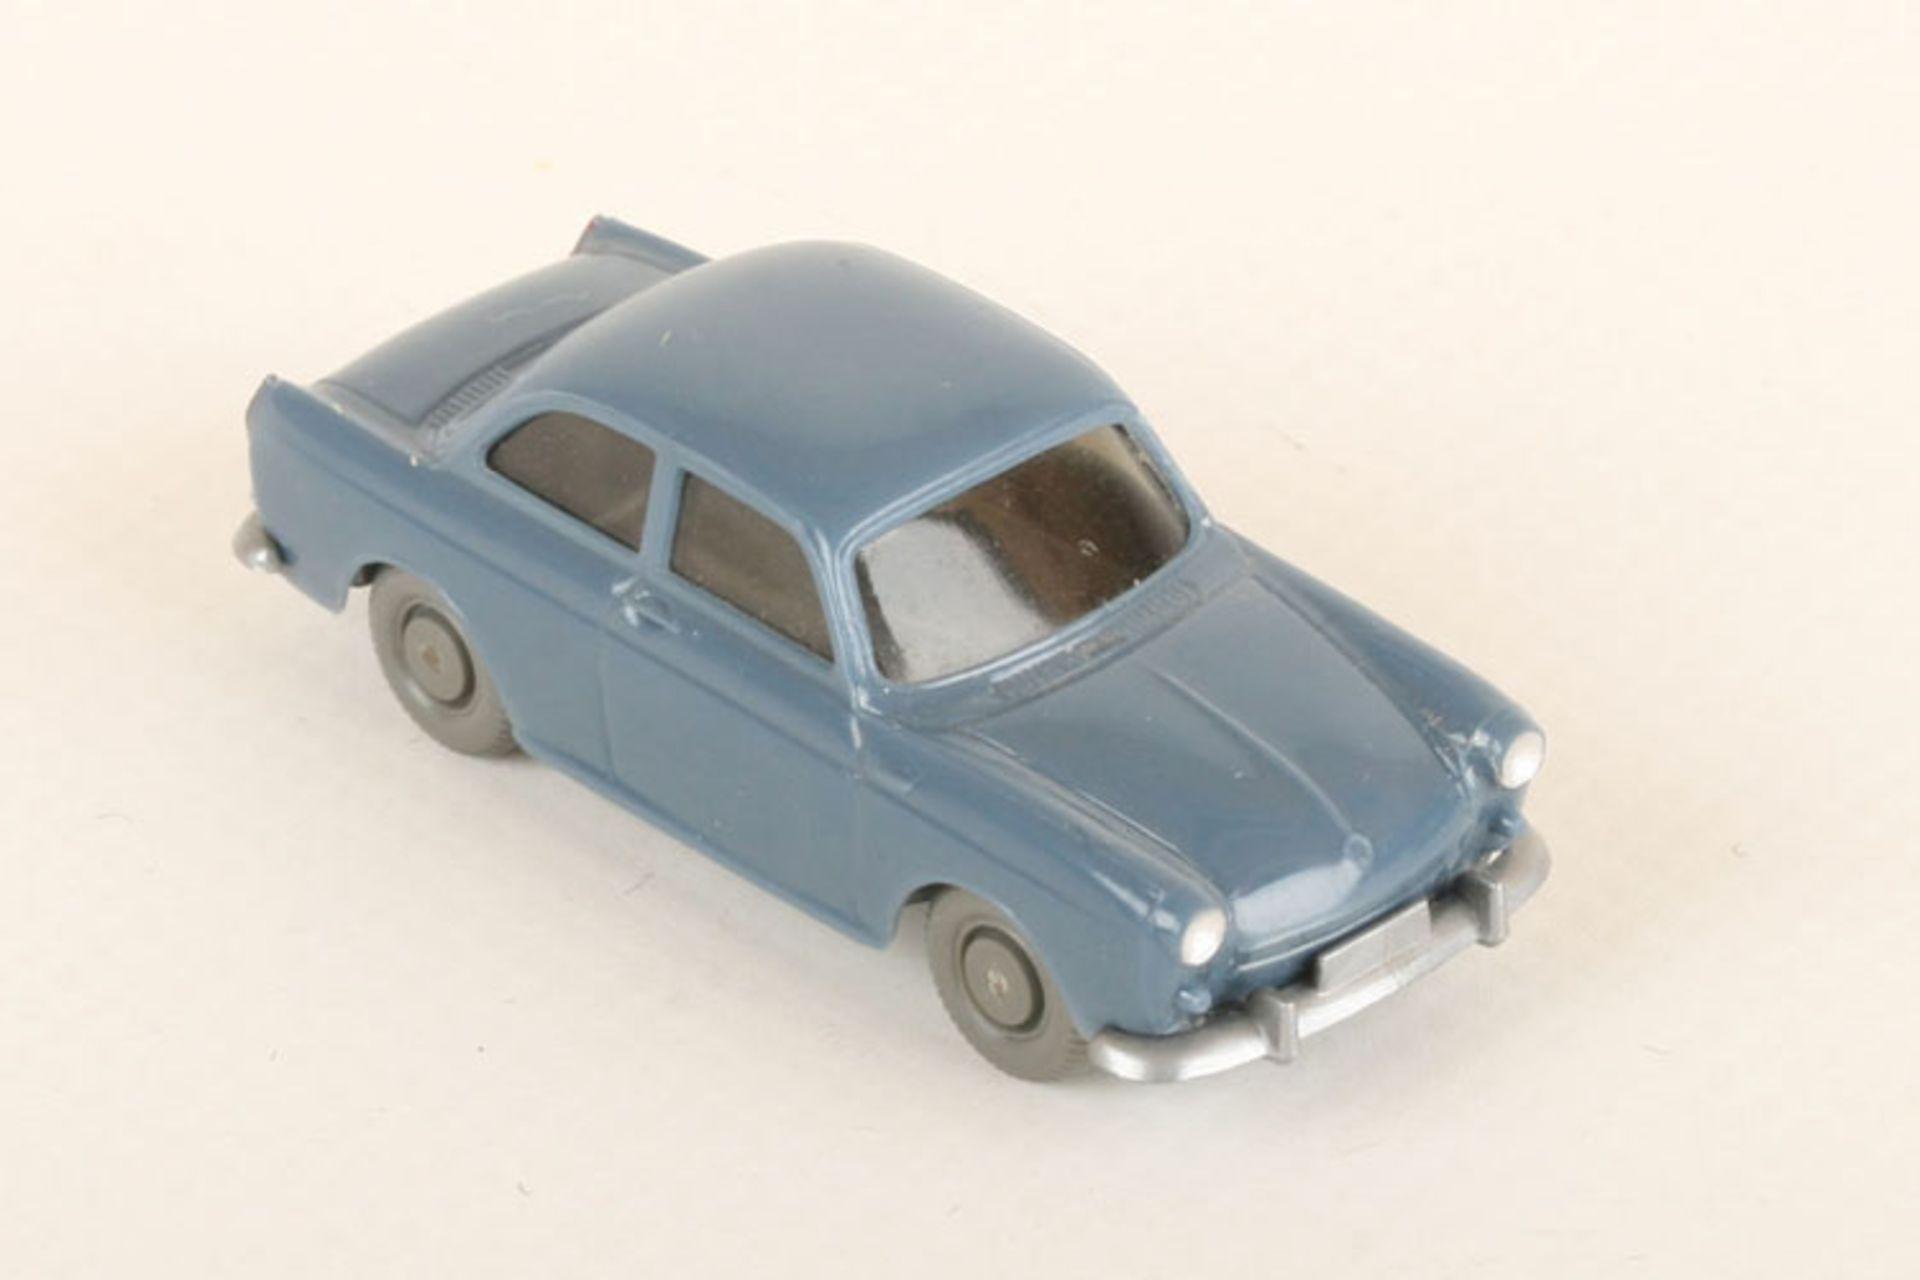 Los 1047 - Wiking VW 1500 taubenblau 40/12e, neuwertig